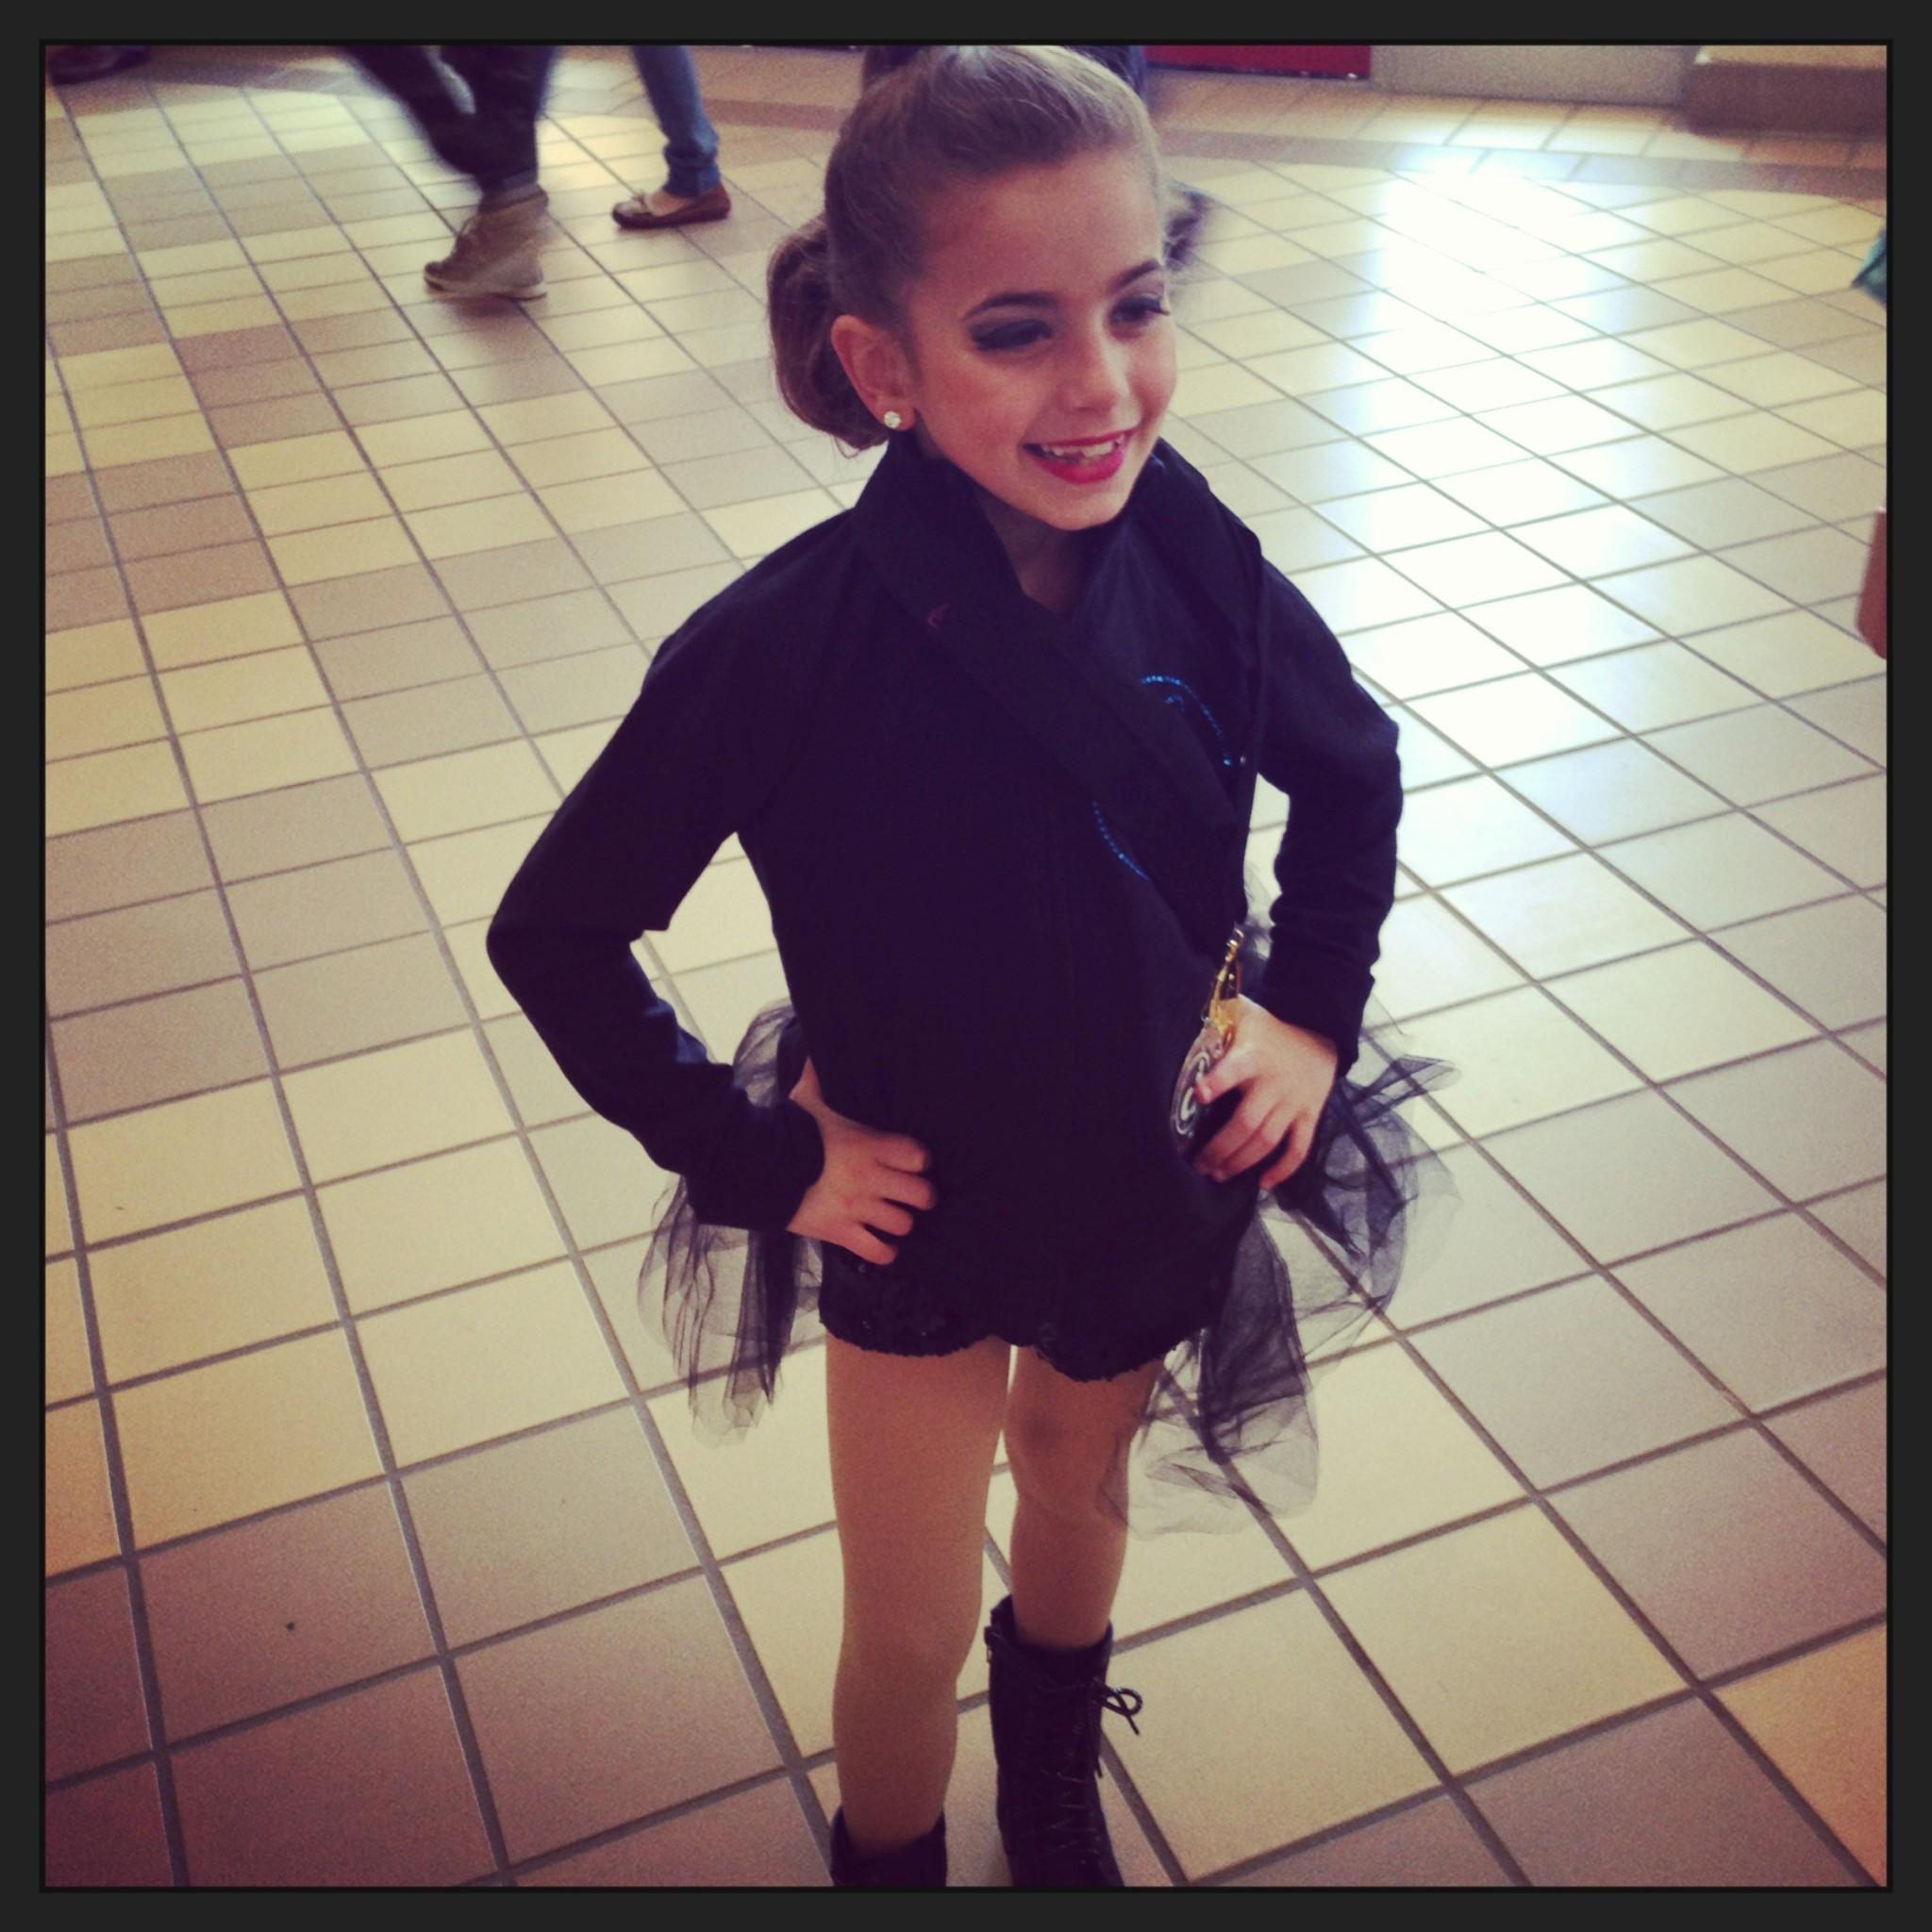 GiaNina-after-Dancers-inc-wins-2048x2048.jpg